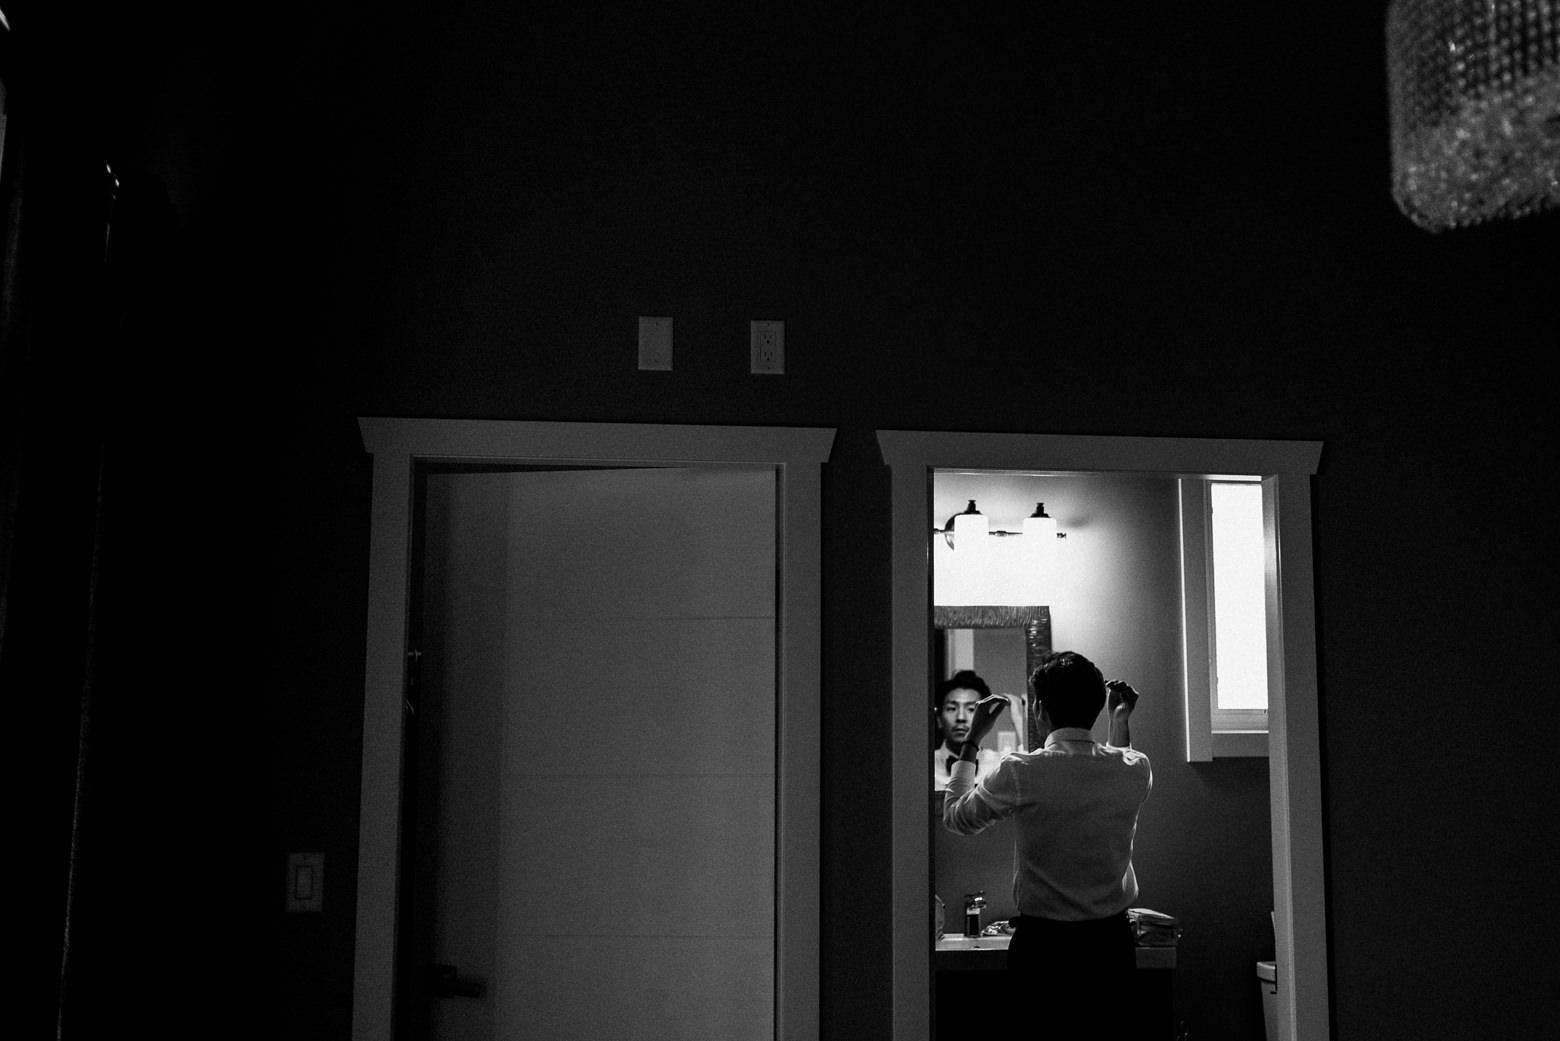 groom getting ready window reflection